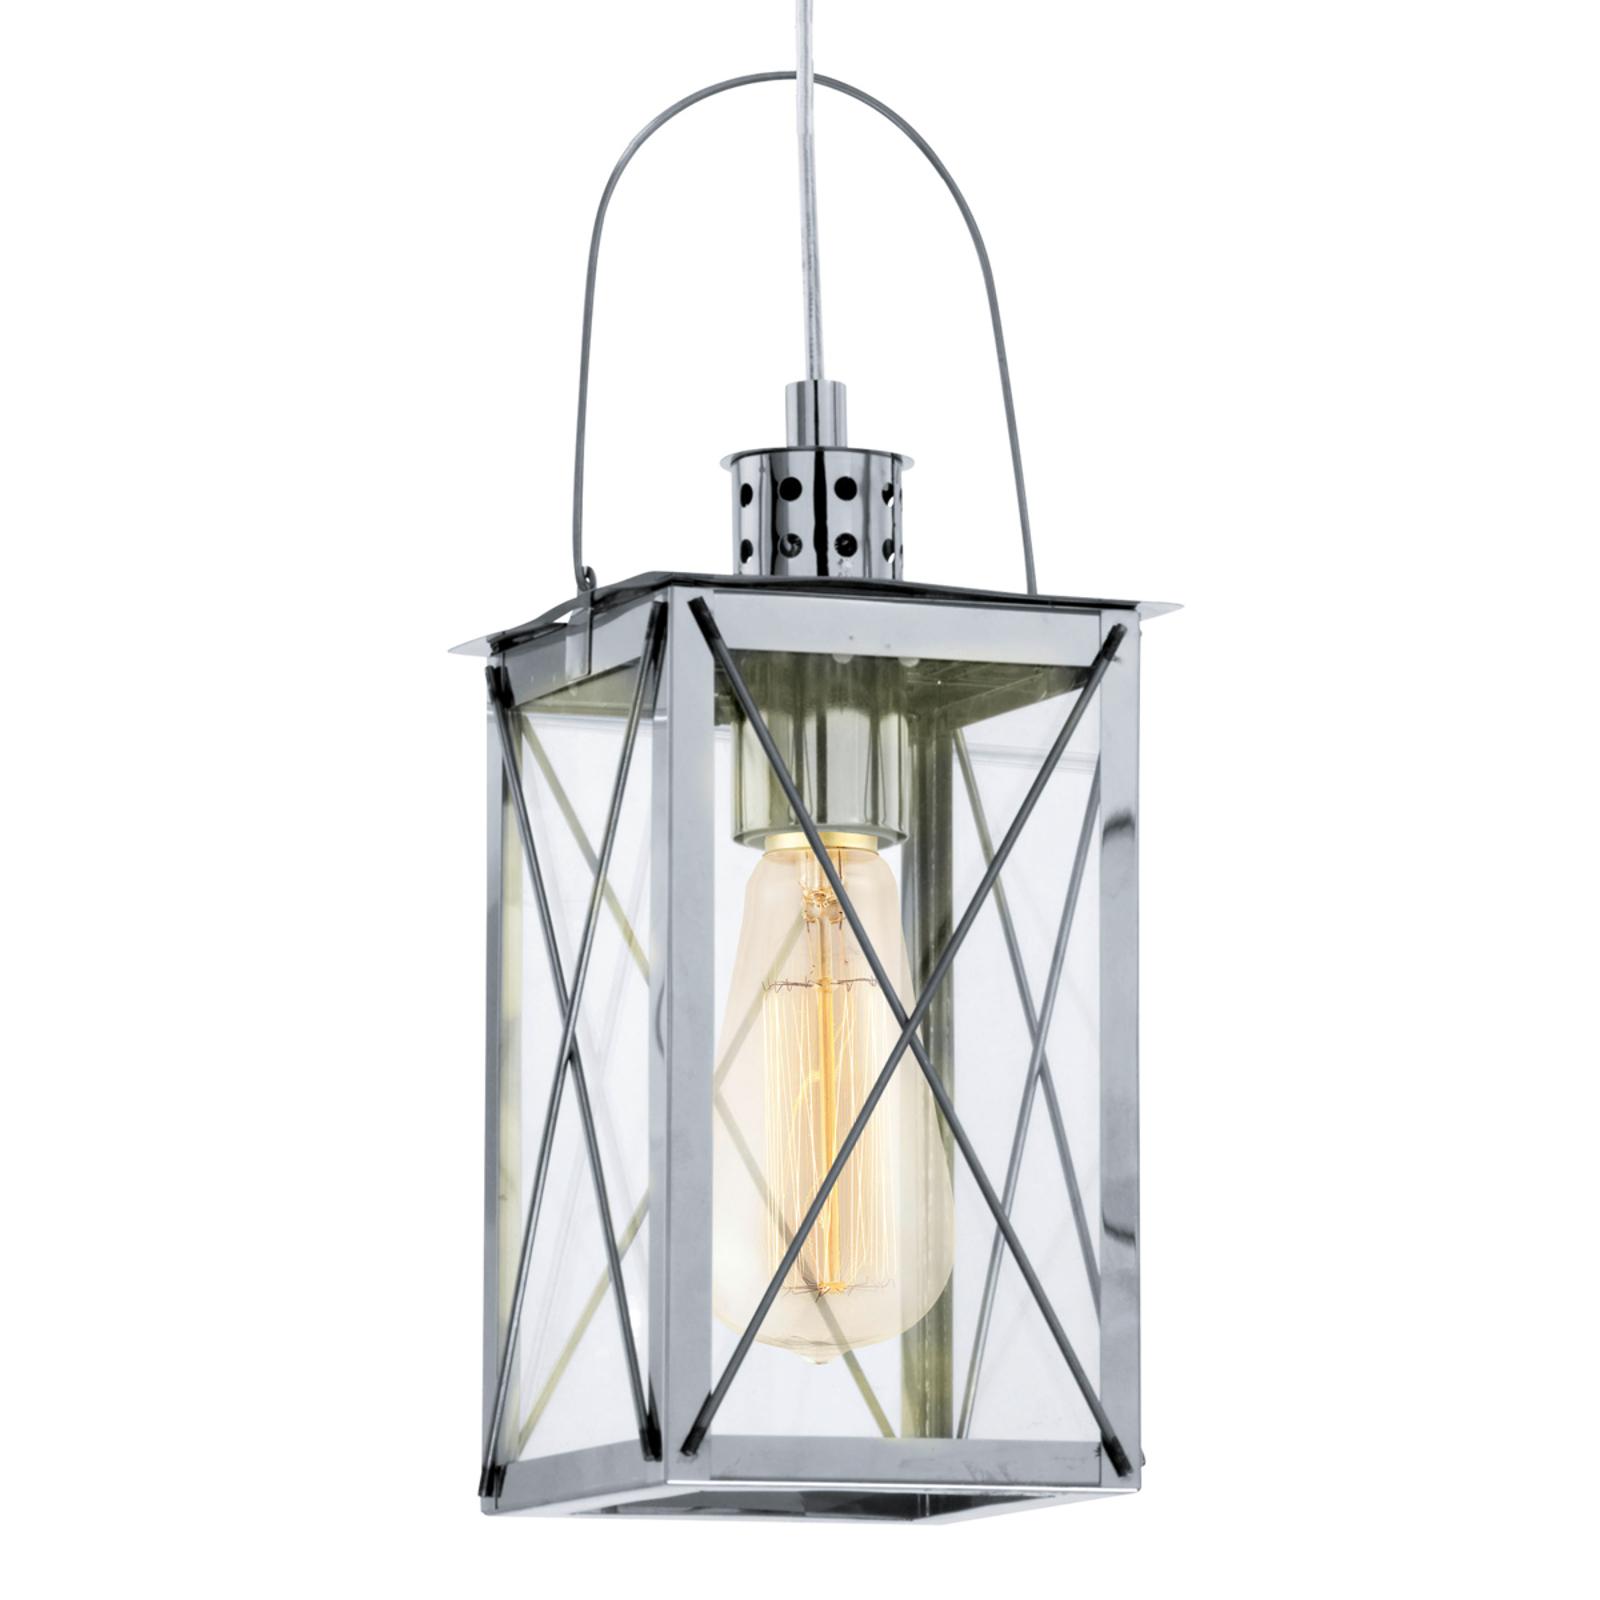 Verchroomde lantaarn hanglamp Maria